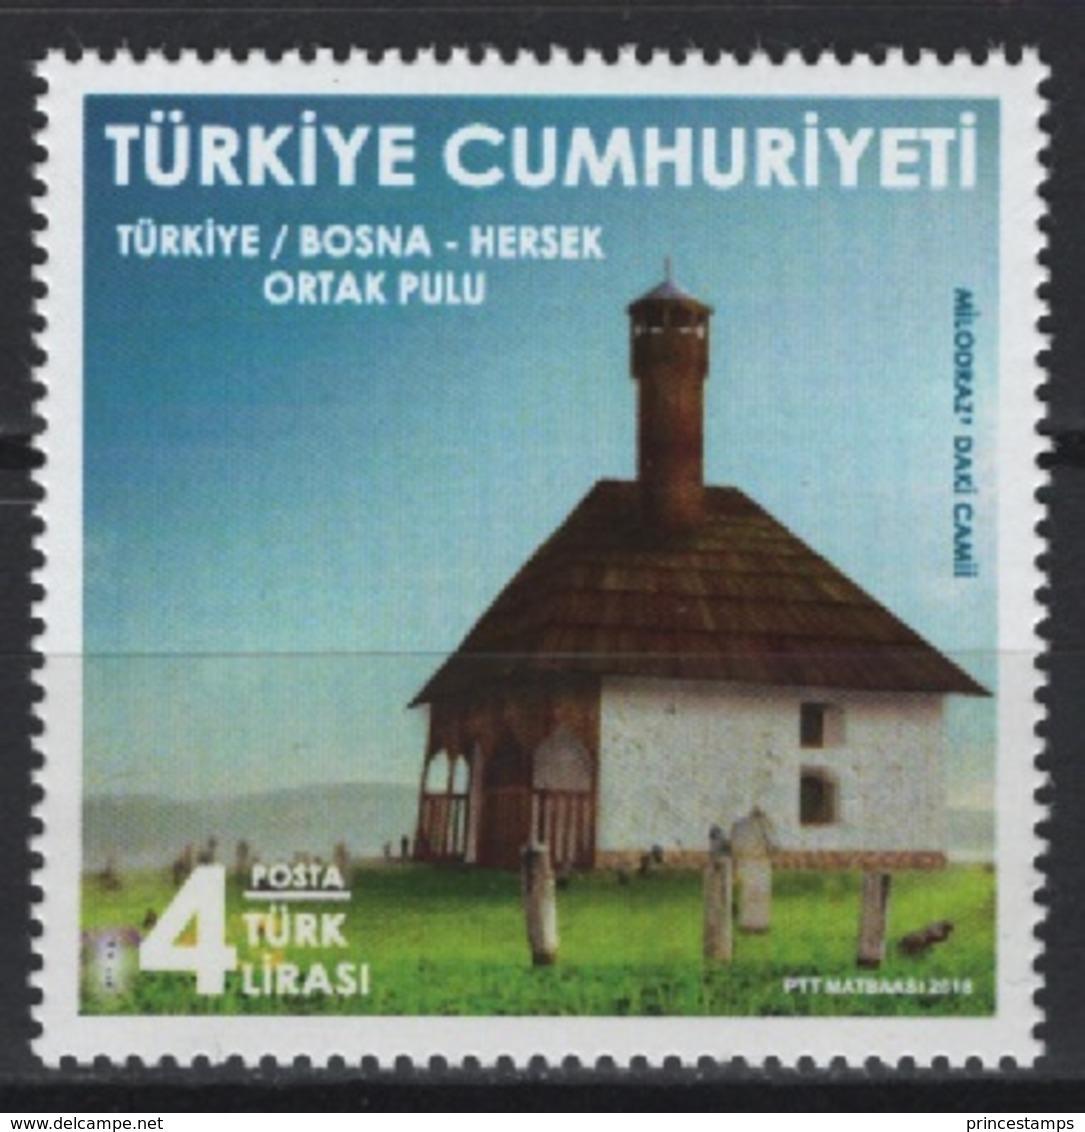 Turquie - Turkey (2018)  - Set -   /  Joint Issue With Bosnia & Herzegovina - Houses - Casas - Maisons - Architecture - Gezamelijke Uitgaven